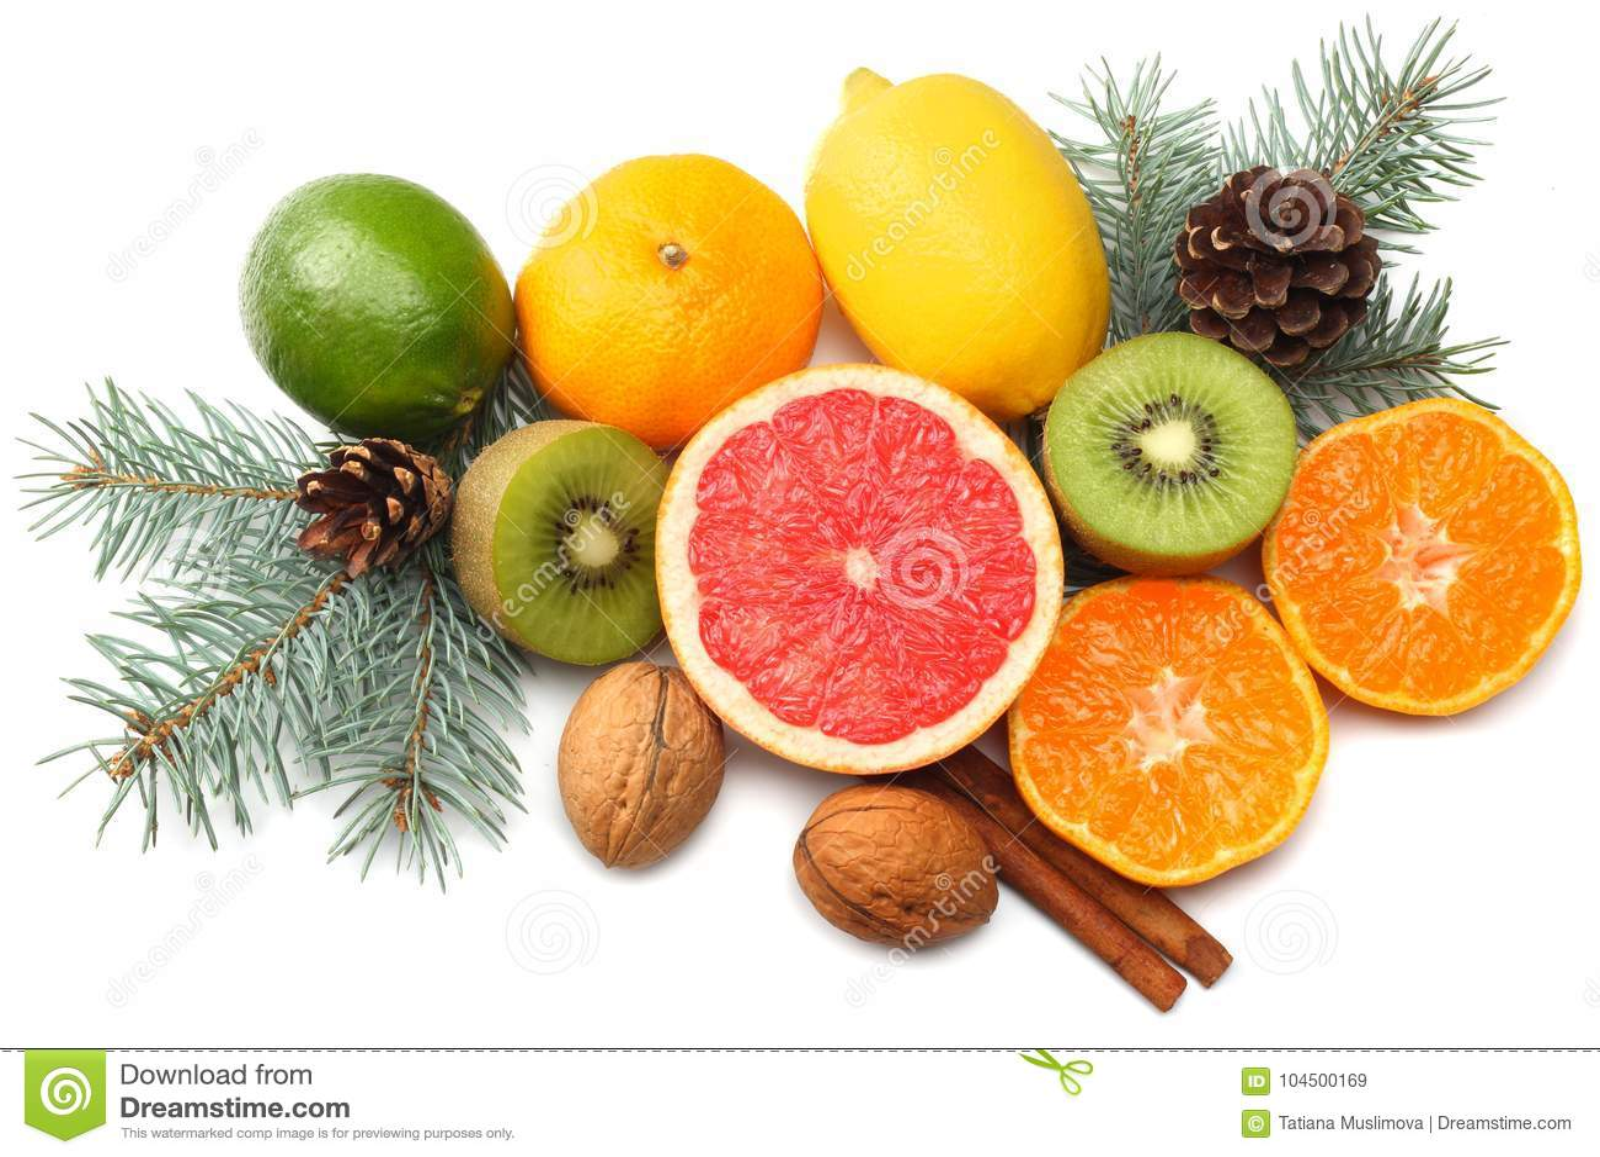 Christmas background. mix sliced lemon, green lime, orange, mandarin, kiwi fruit and grapefruit with cone and fir tree isolated